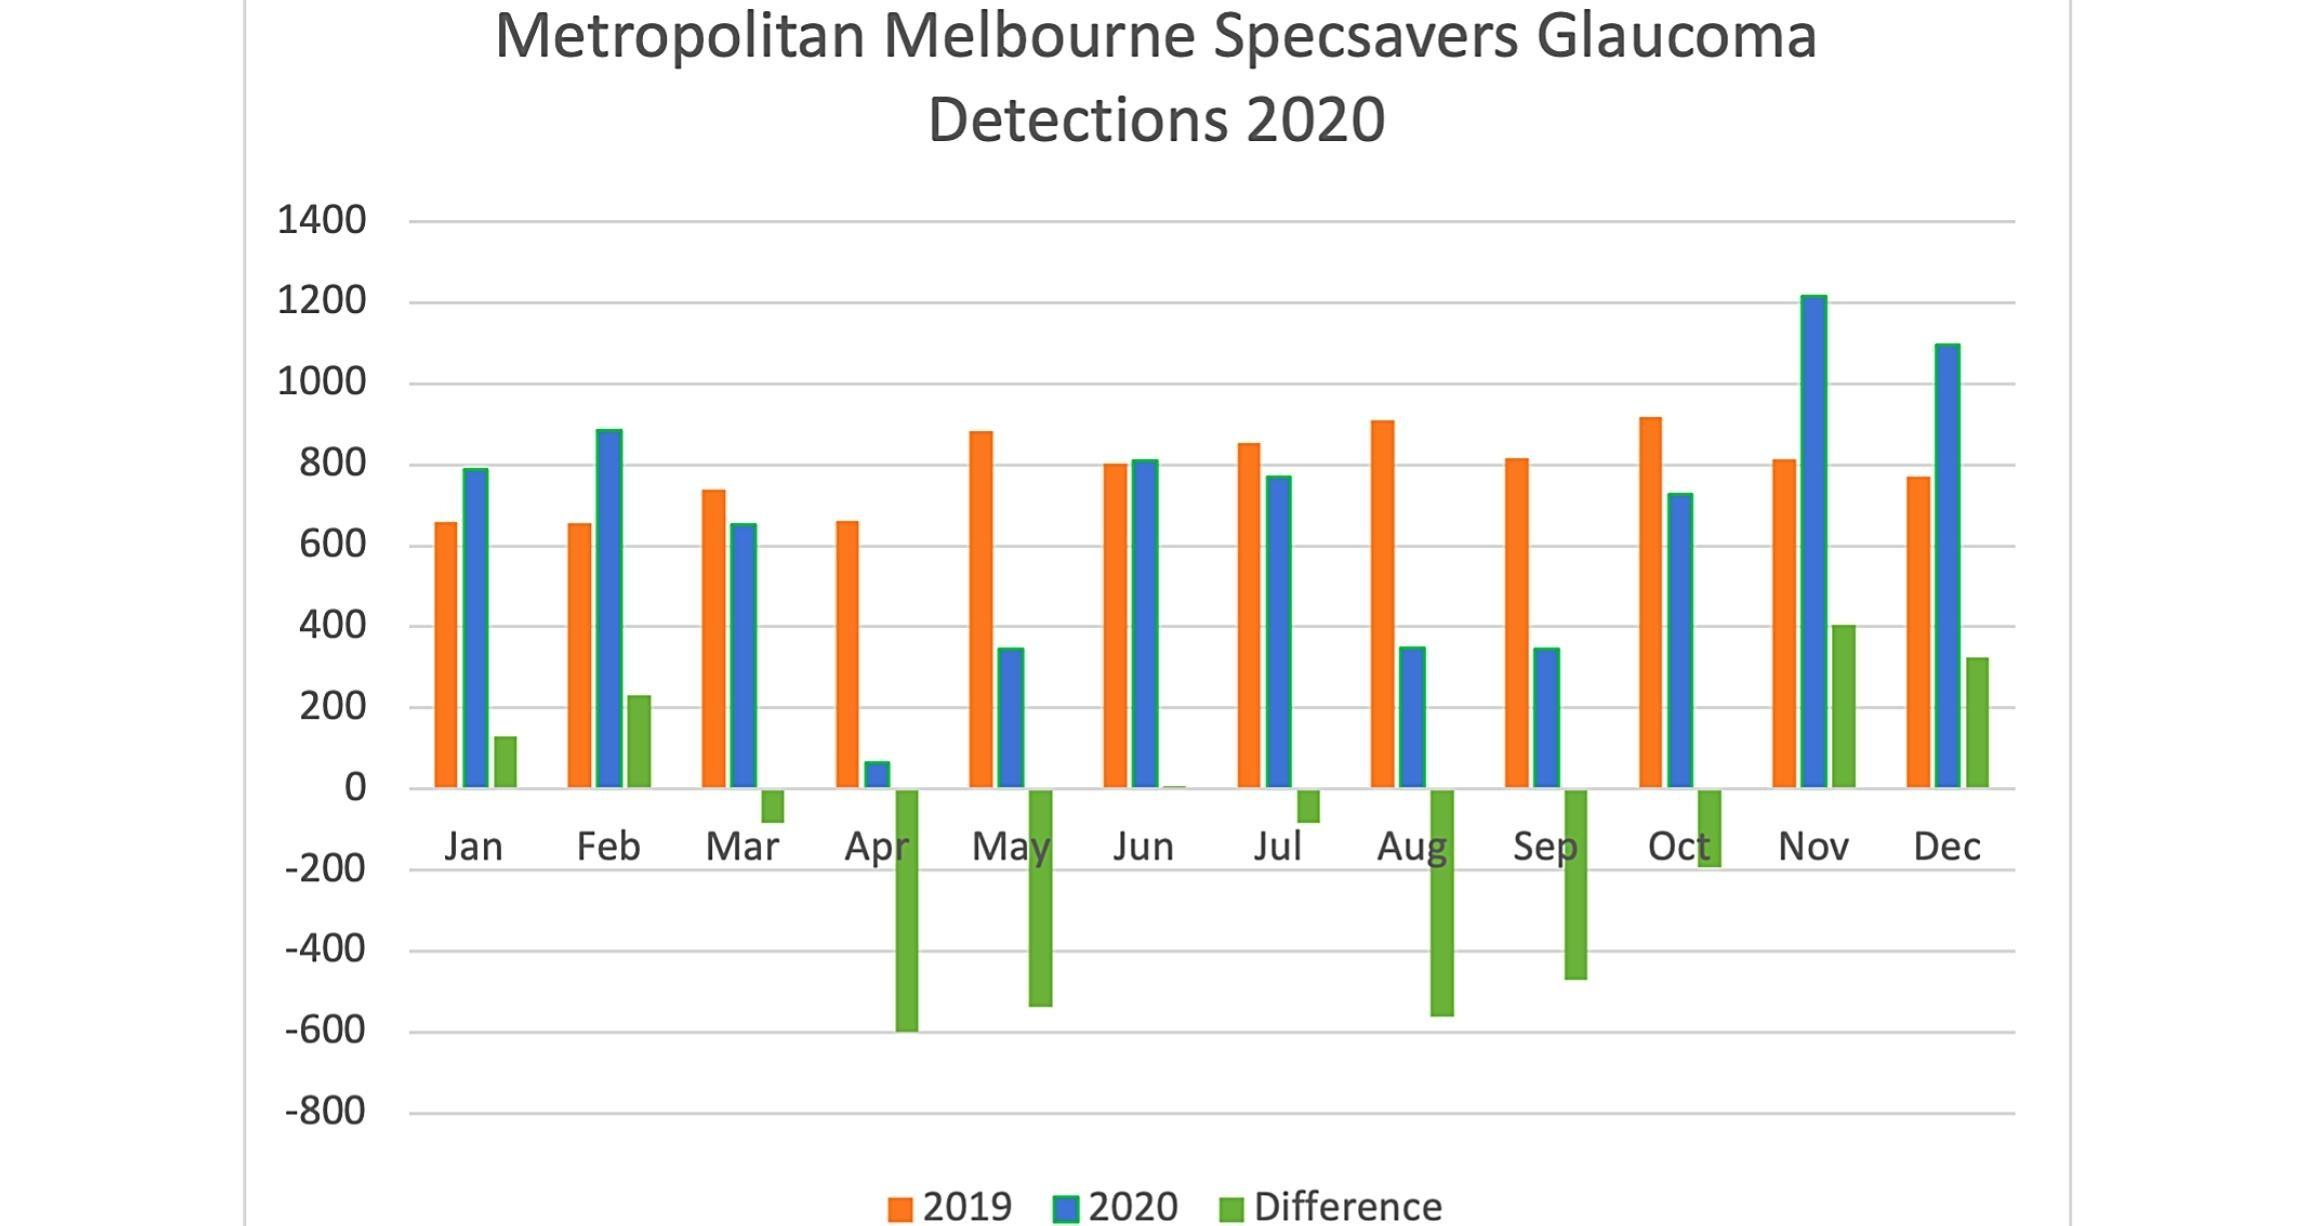 Figure 3. Metropolitan Melbourne glaucoma detections in 2020.